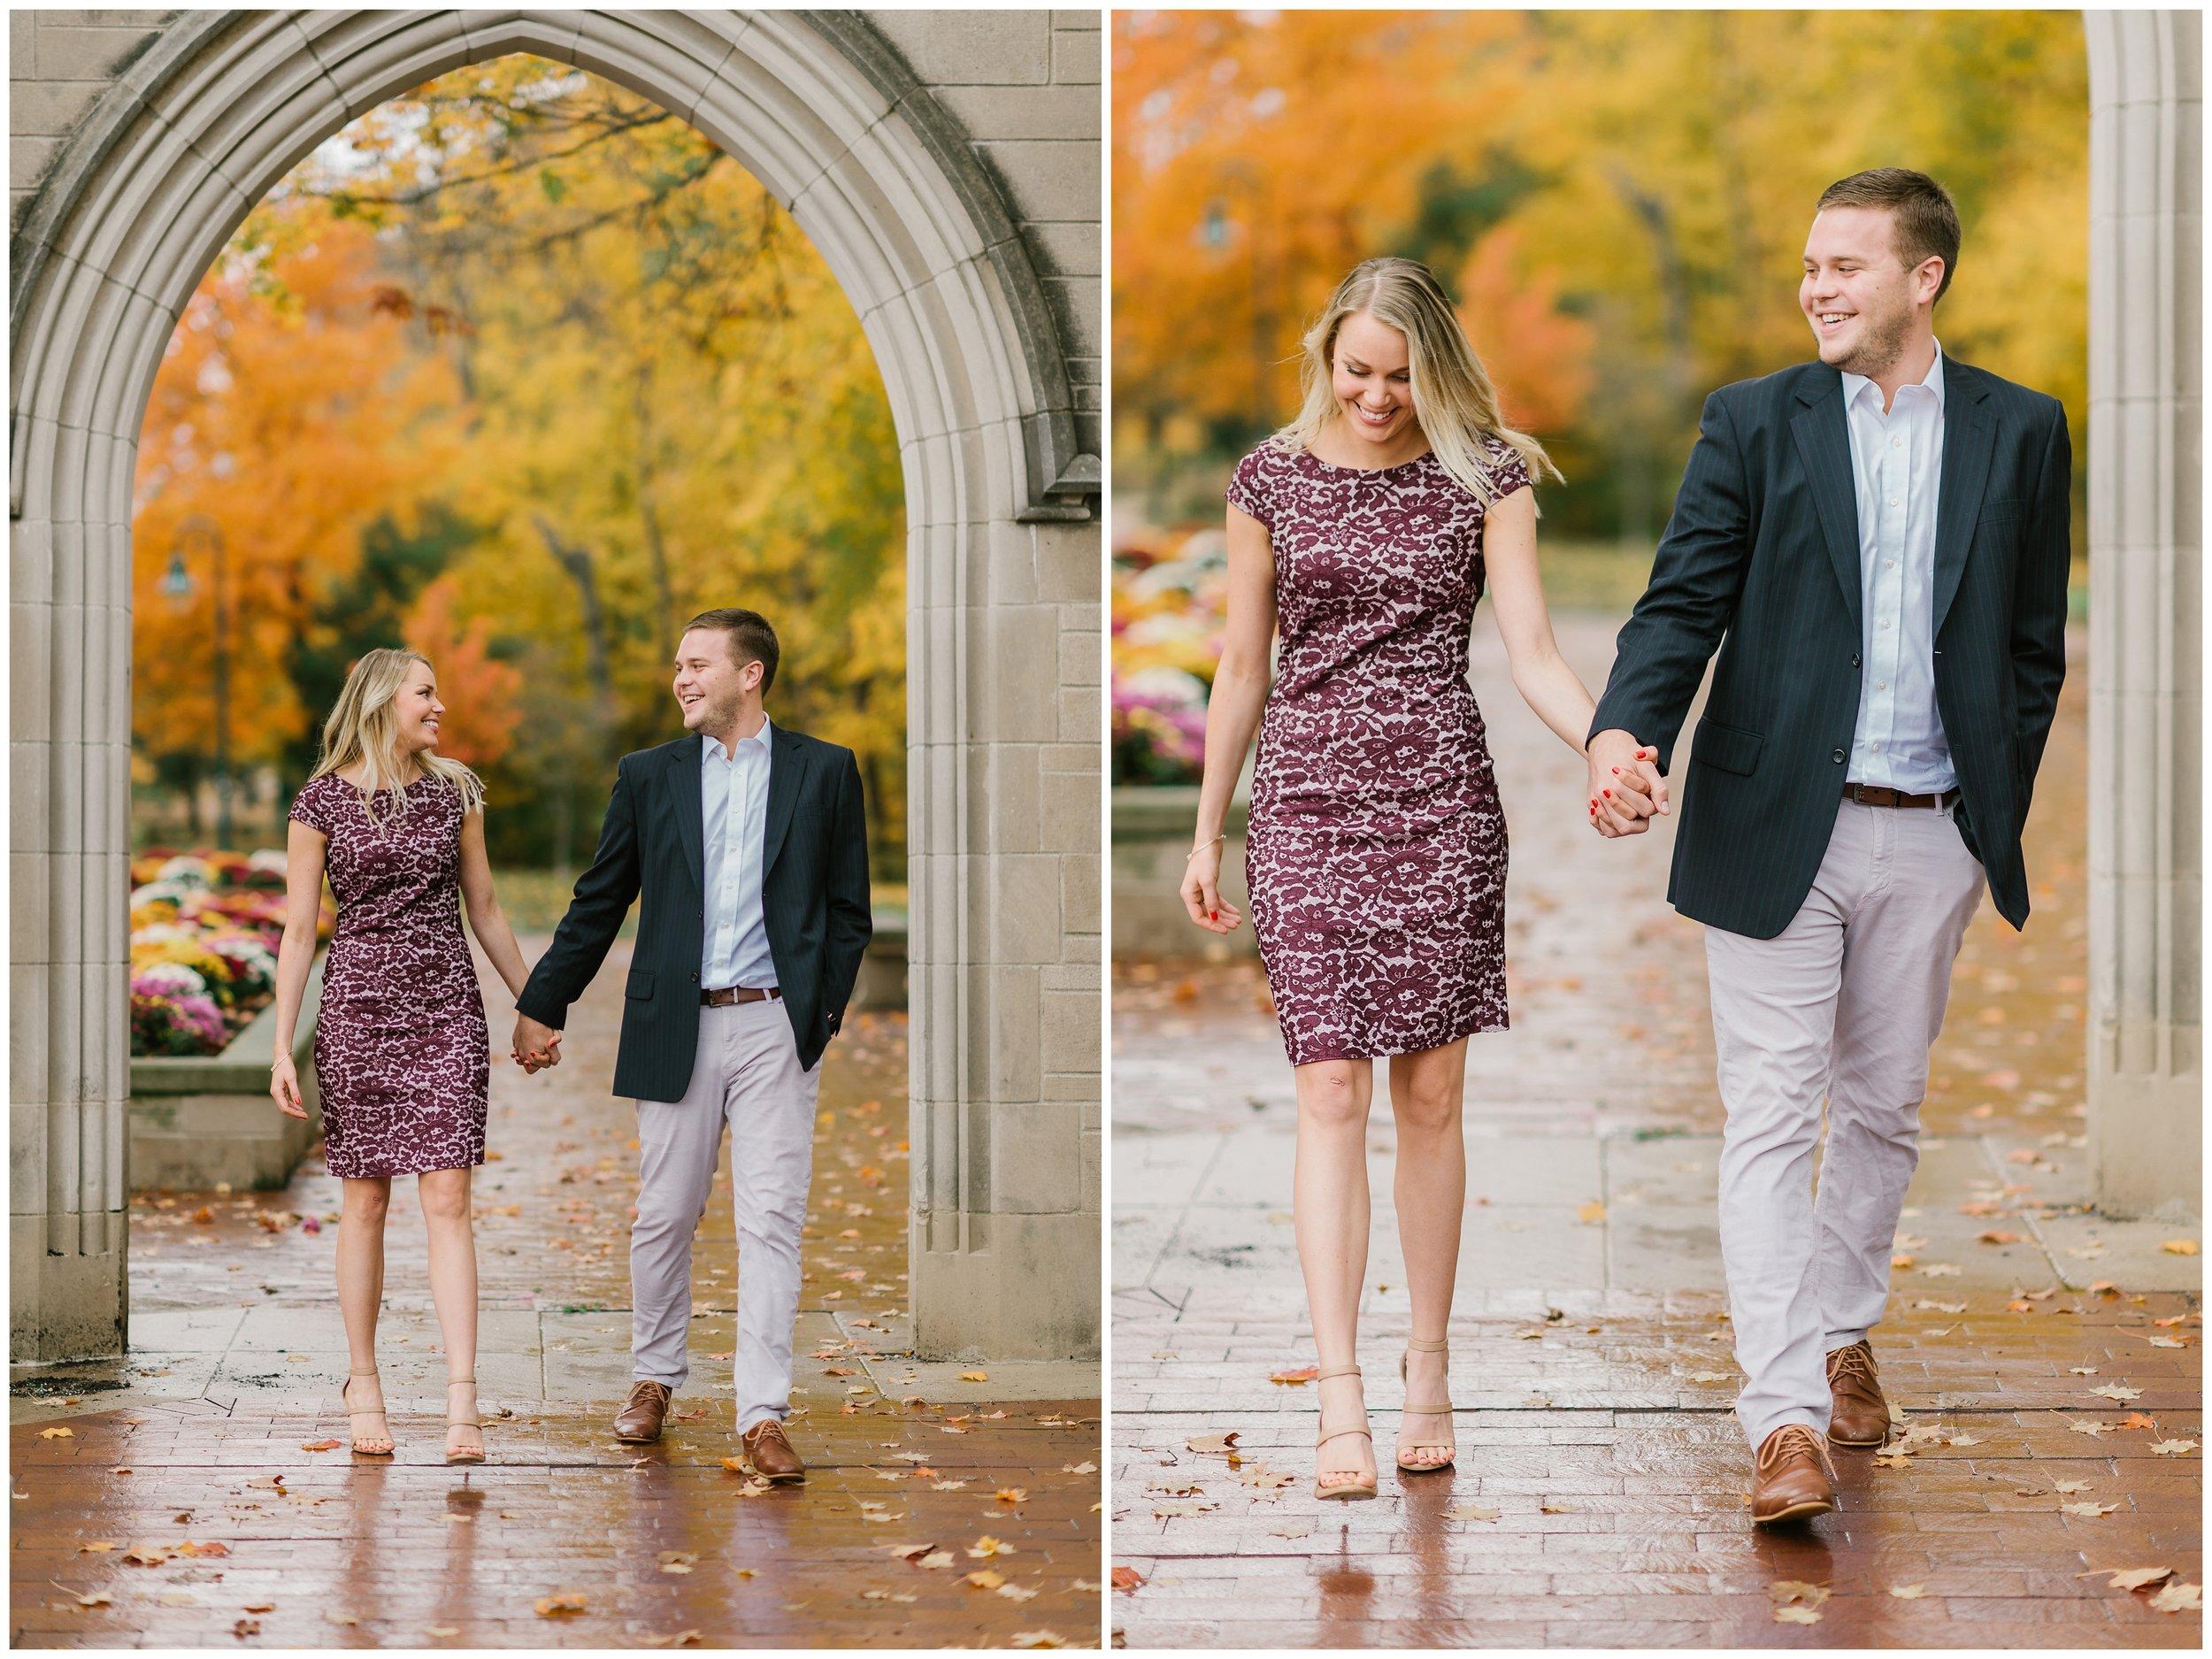 Rebecca_Shehorn_Photography_Indianapolis_Wedding_Photographer_7676.jpg